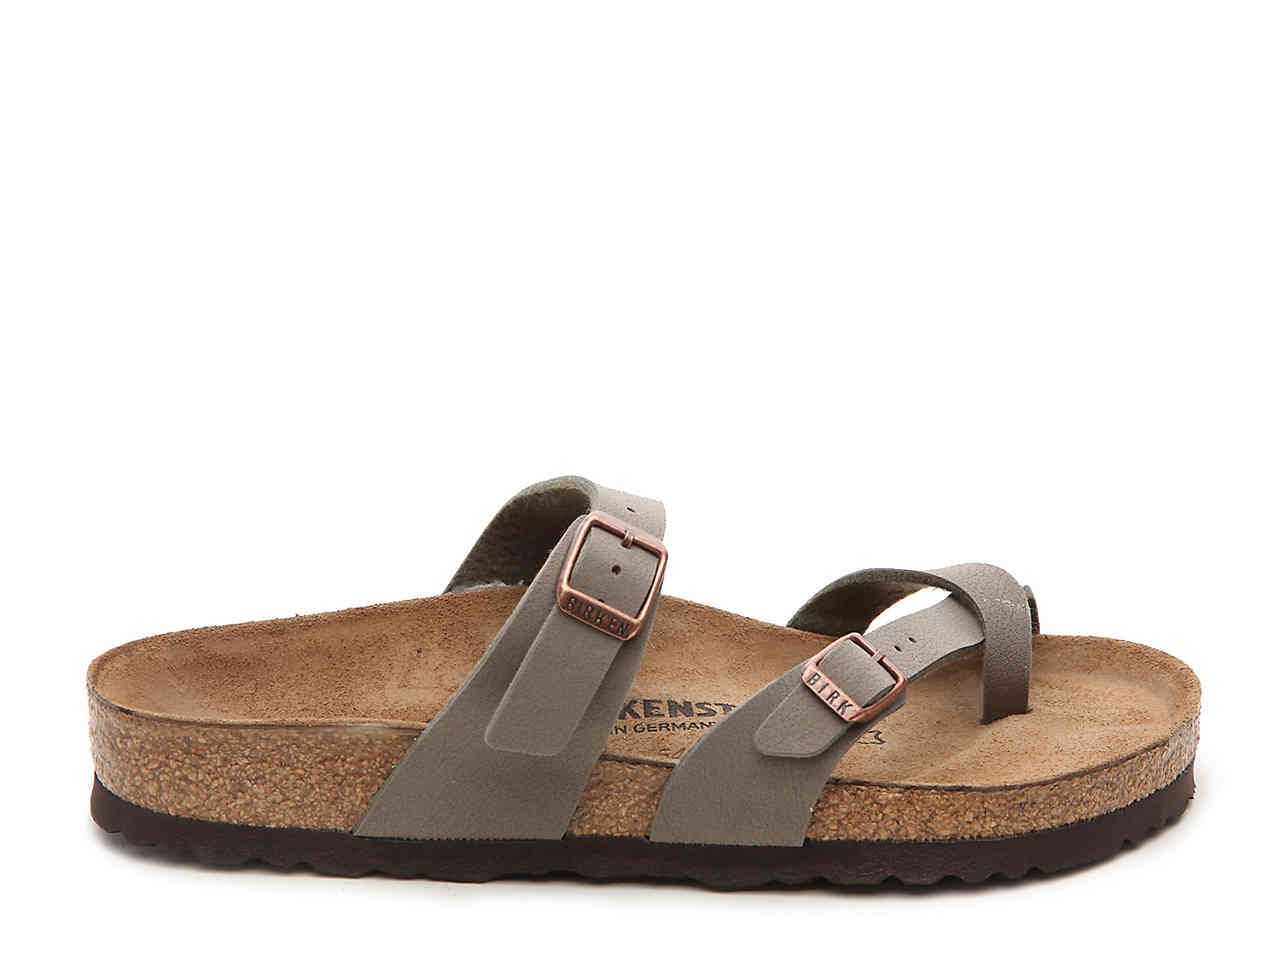 Birkenstock Mayari Sandal - Women's in